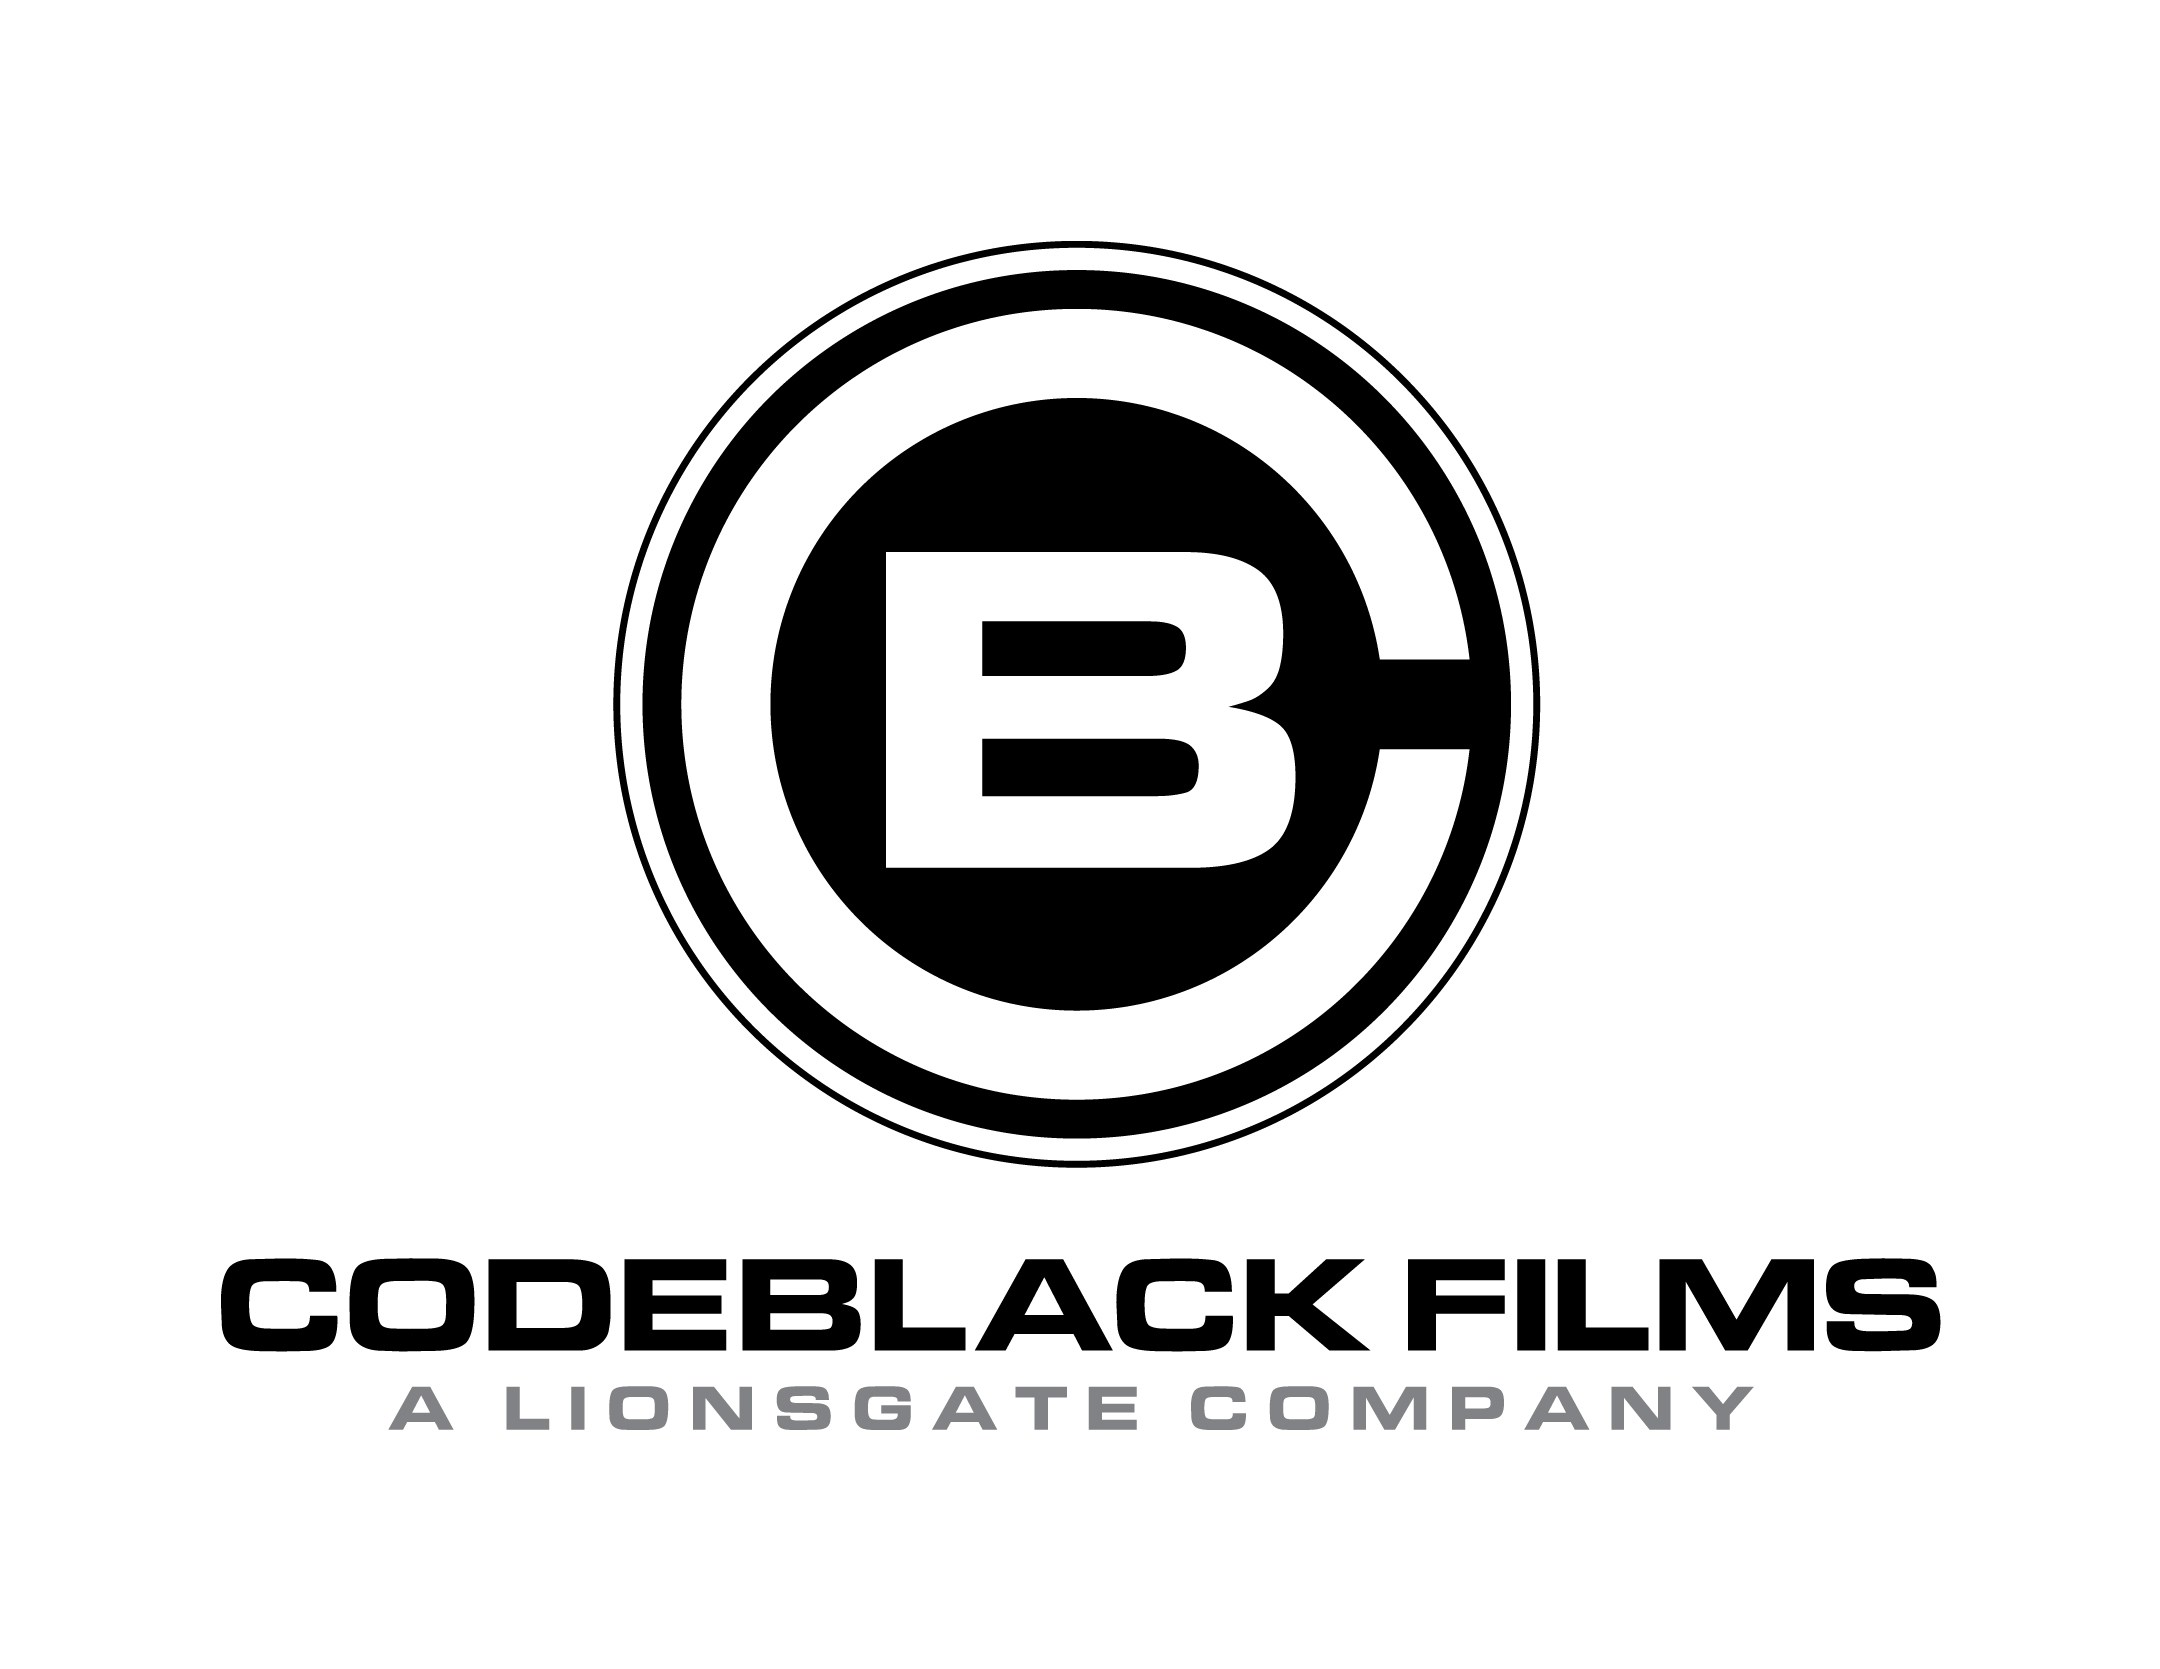 Codeblack Entertainment